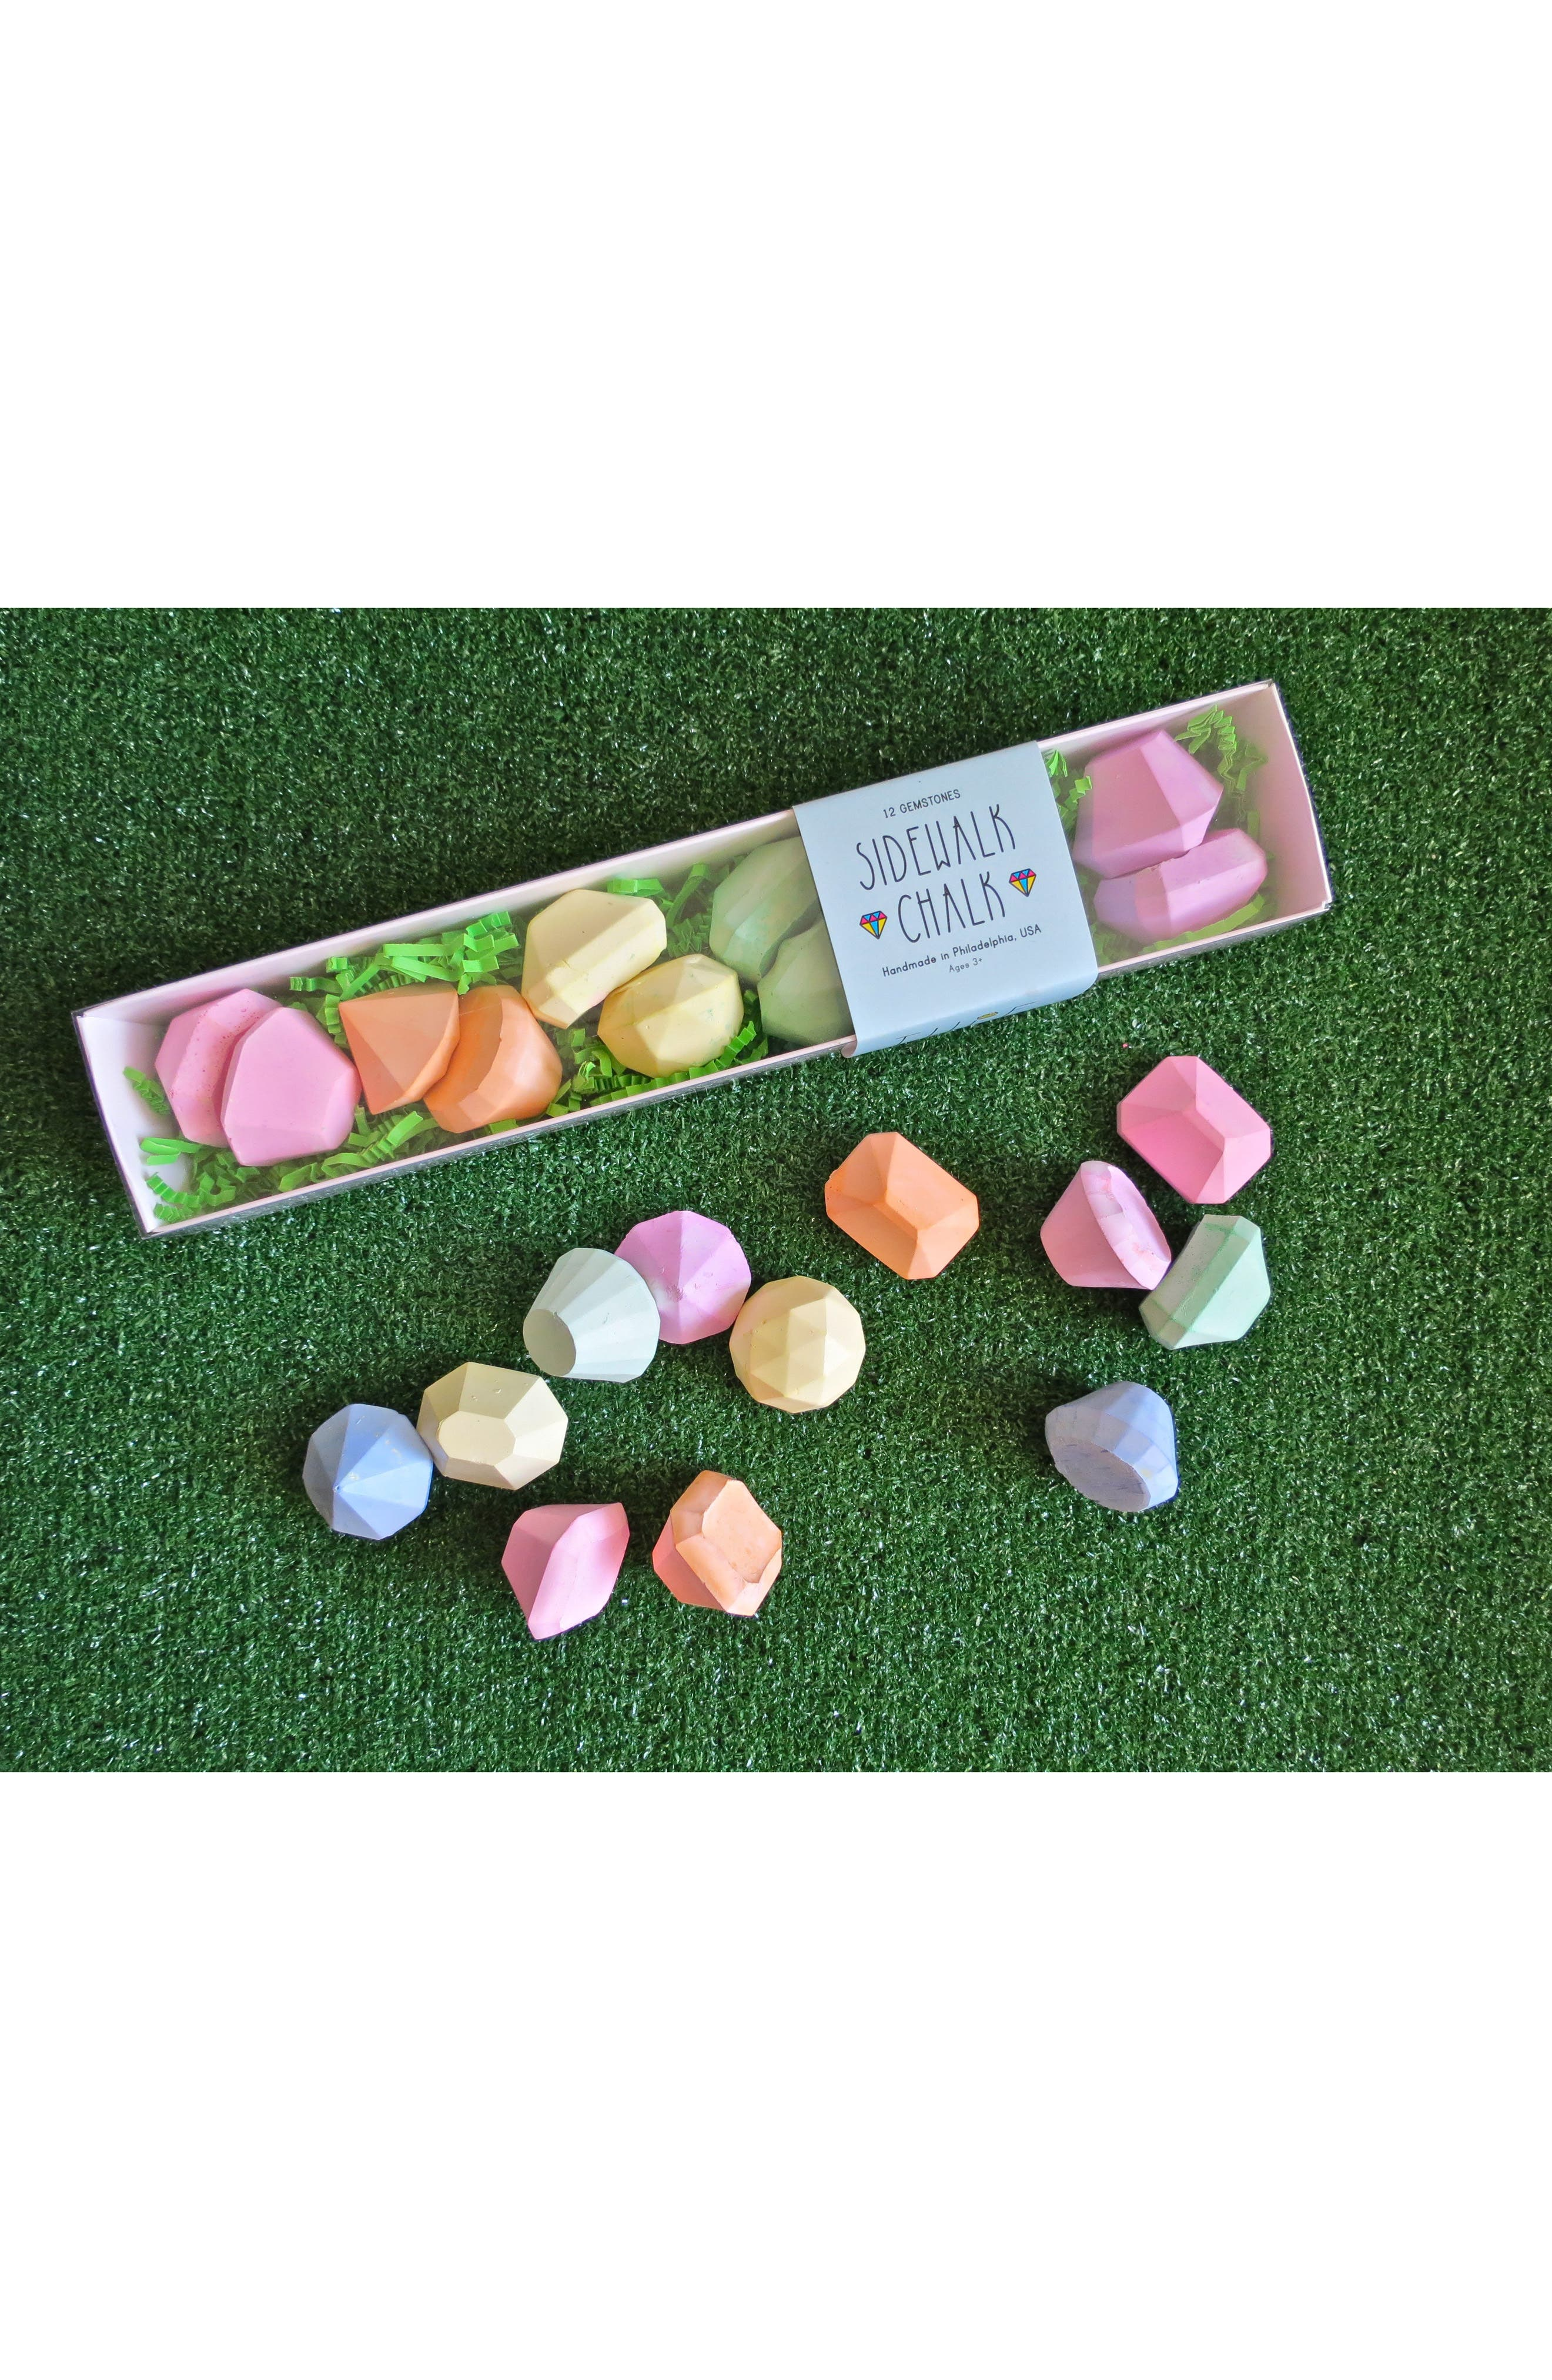 24-Piece Gemstone Sidewalk Chalk Set,                         Main,                         color, 300